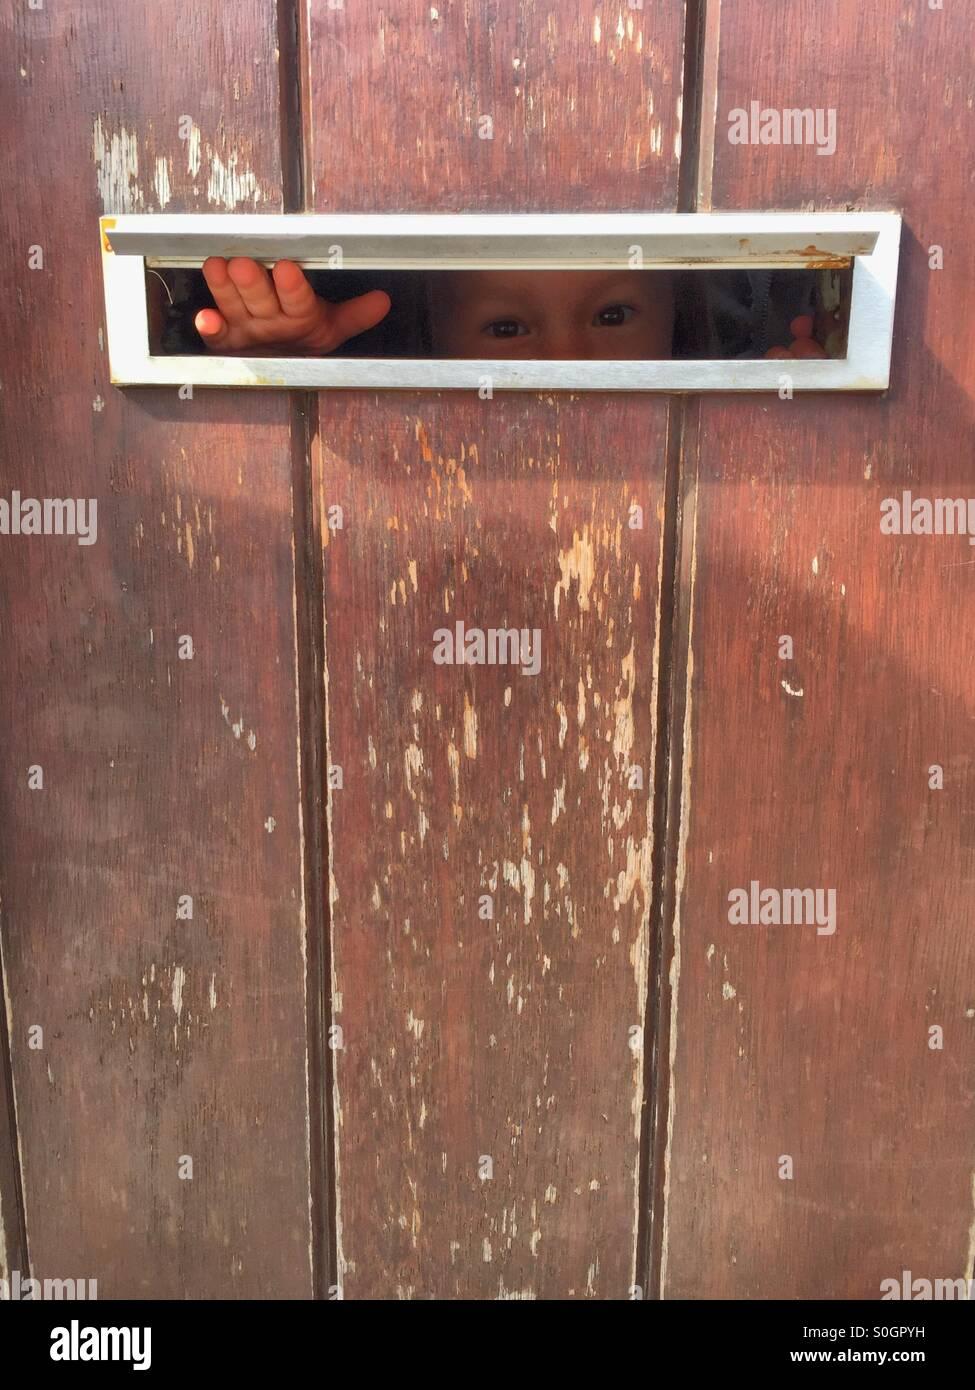 Little scared Child Peeking through the letterbox of a weathered door. & Little scared Child Peeking through the letterbox of a weathered ... Pezcame.Com